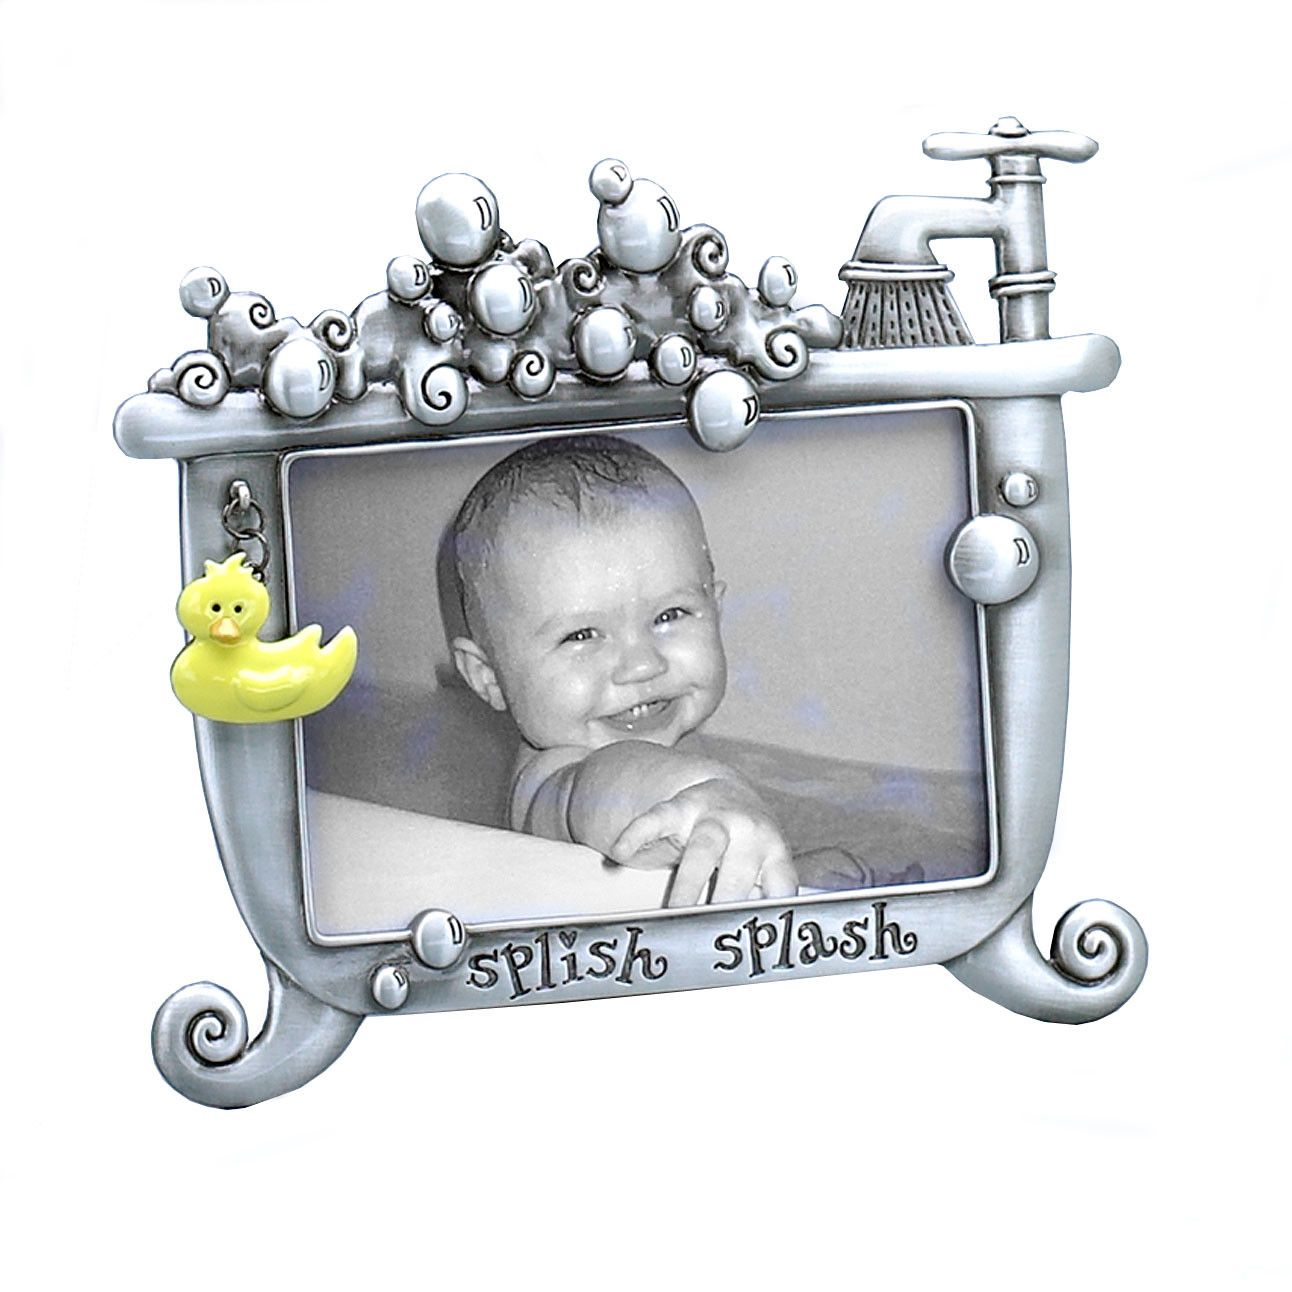 Fetco home decor expressions lexi baby splish splash picture frame fetco home decor expressions lexi baby splish splash picture frame wayfair jeuxipadfo Gallery